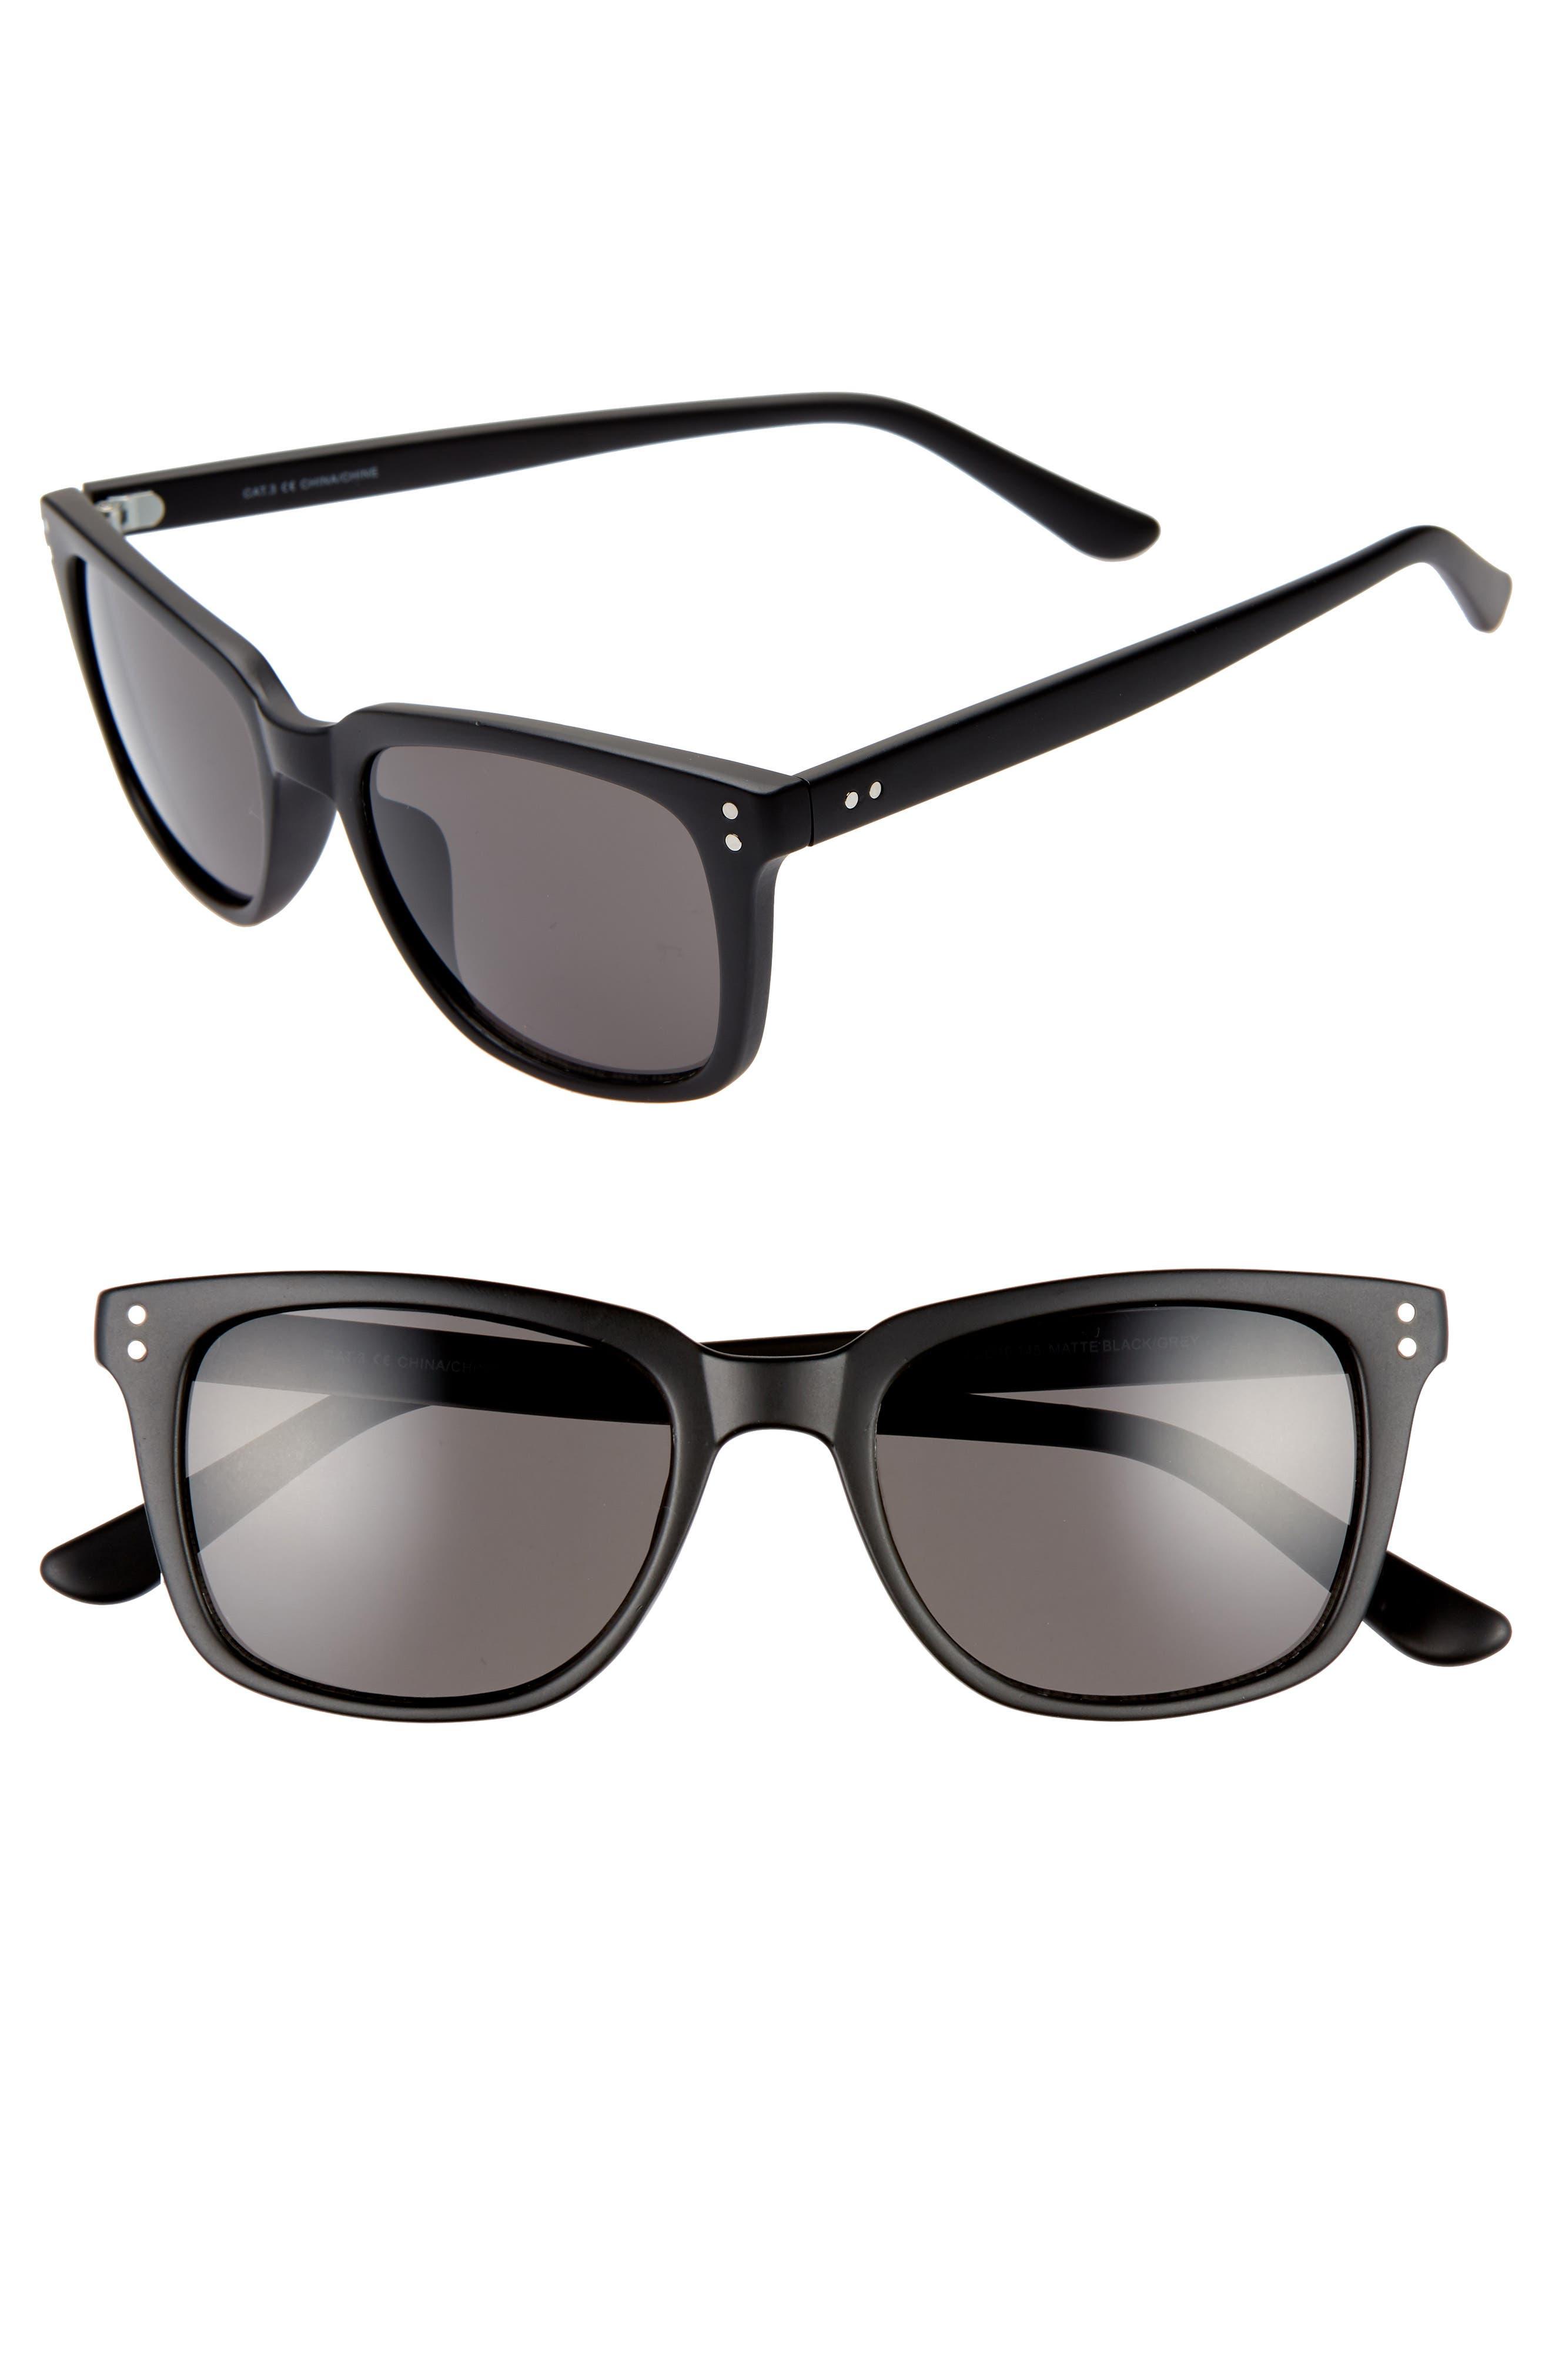 Curtis 52mm Square Sunglasses,                             Main thumbnail 1, color,                             MATTE BLACK/ GREY